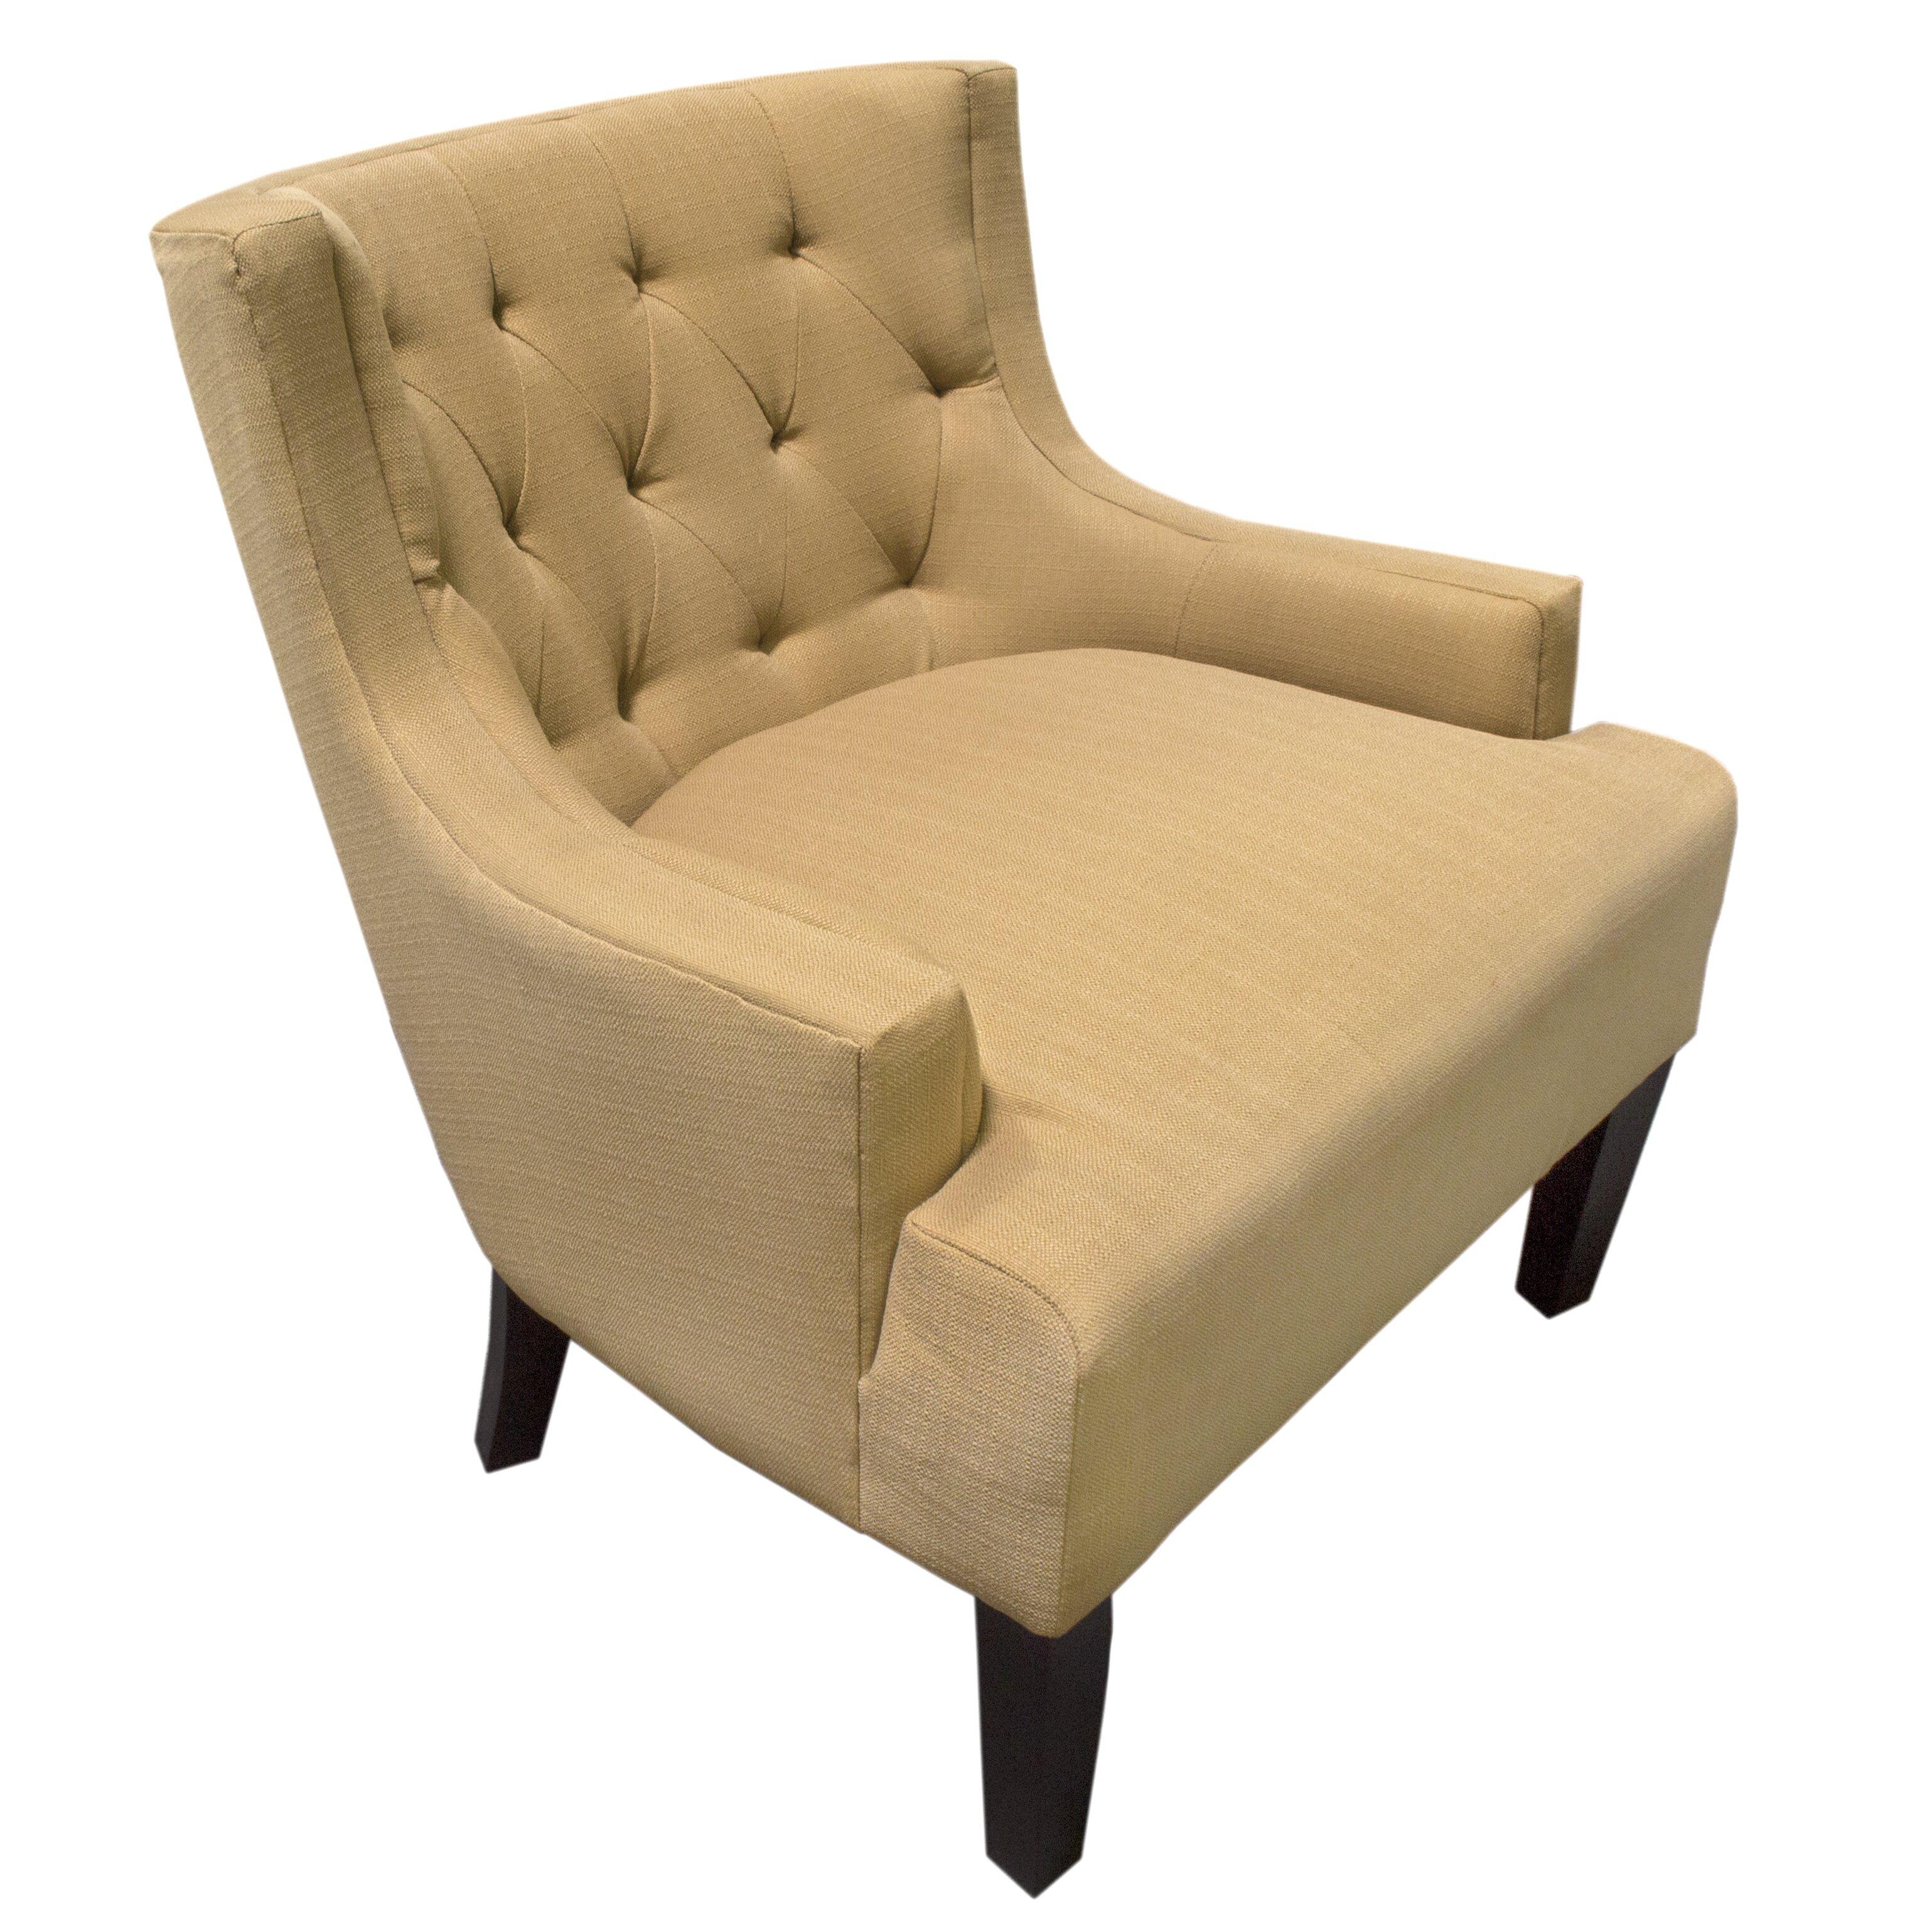 Living Room Arm Chairs Alcott Hill Erwin Living Room Barrel Arm Chair Reviews Wayfair